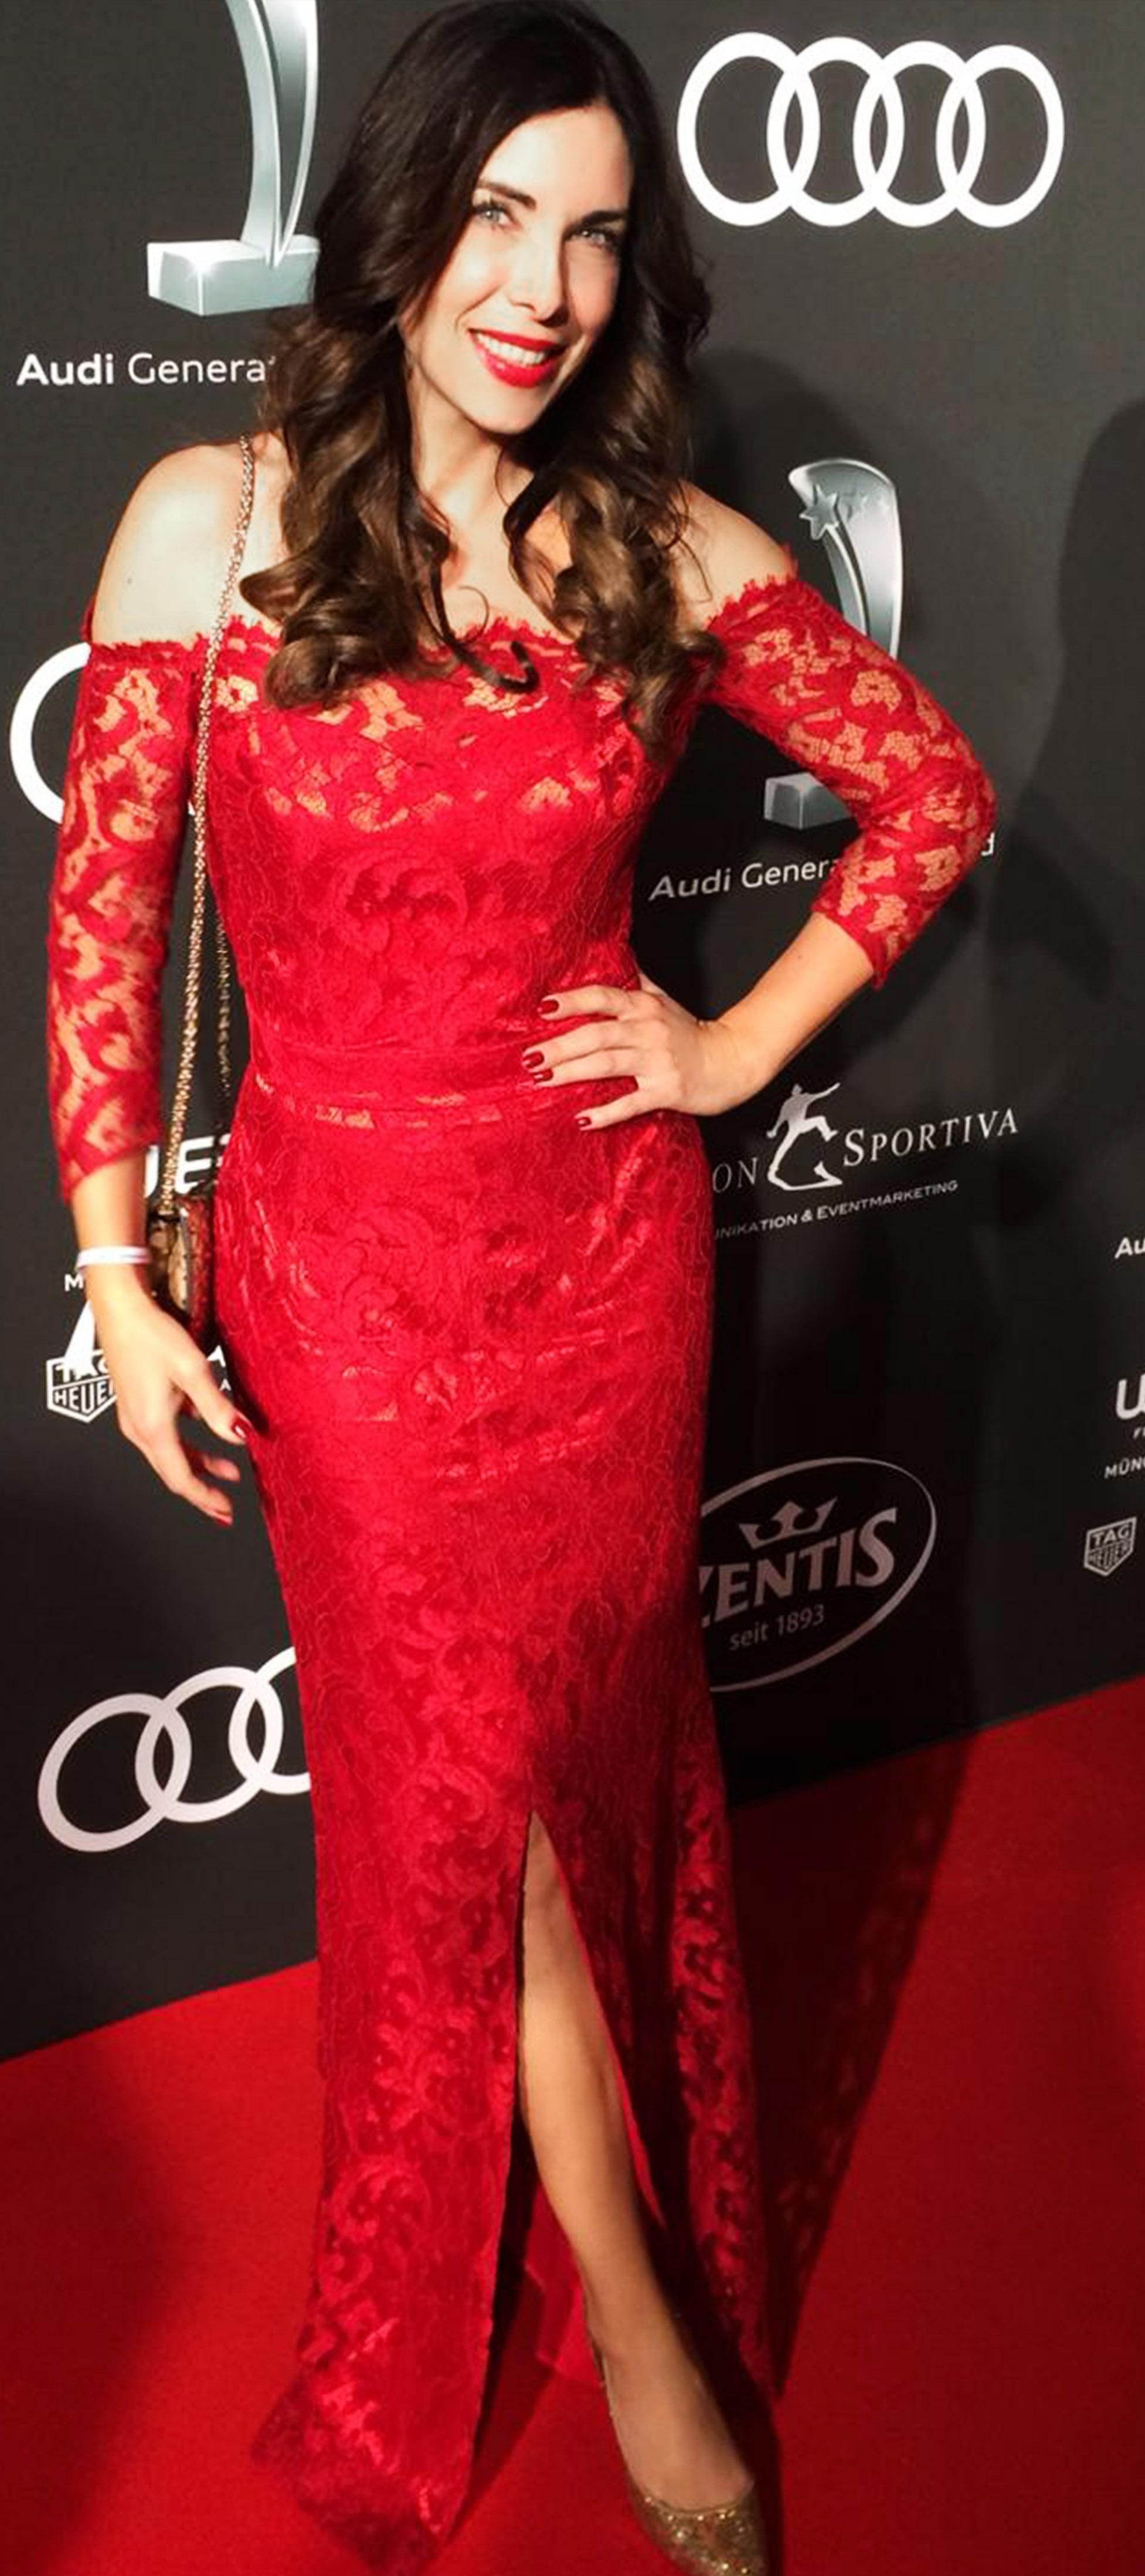 Carmenkleid aus roter Spitze